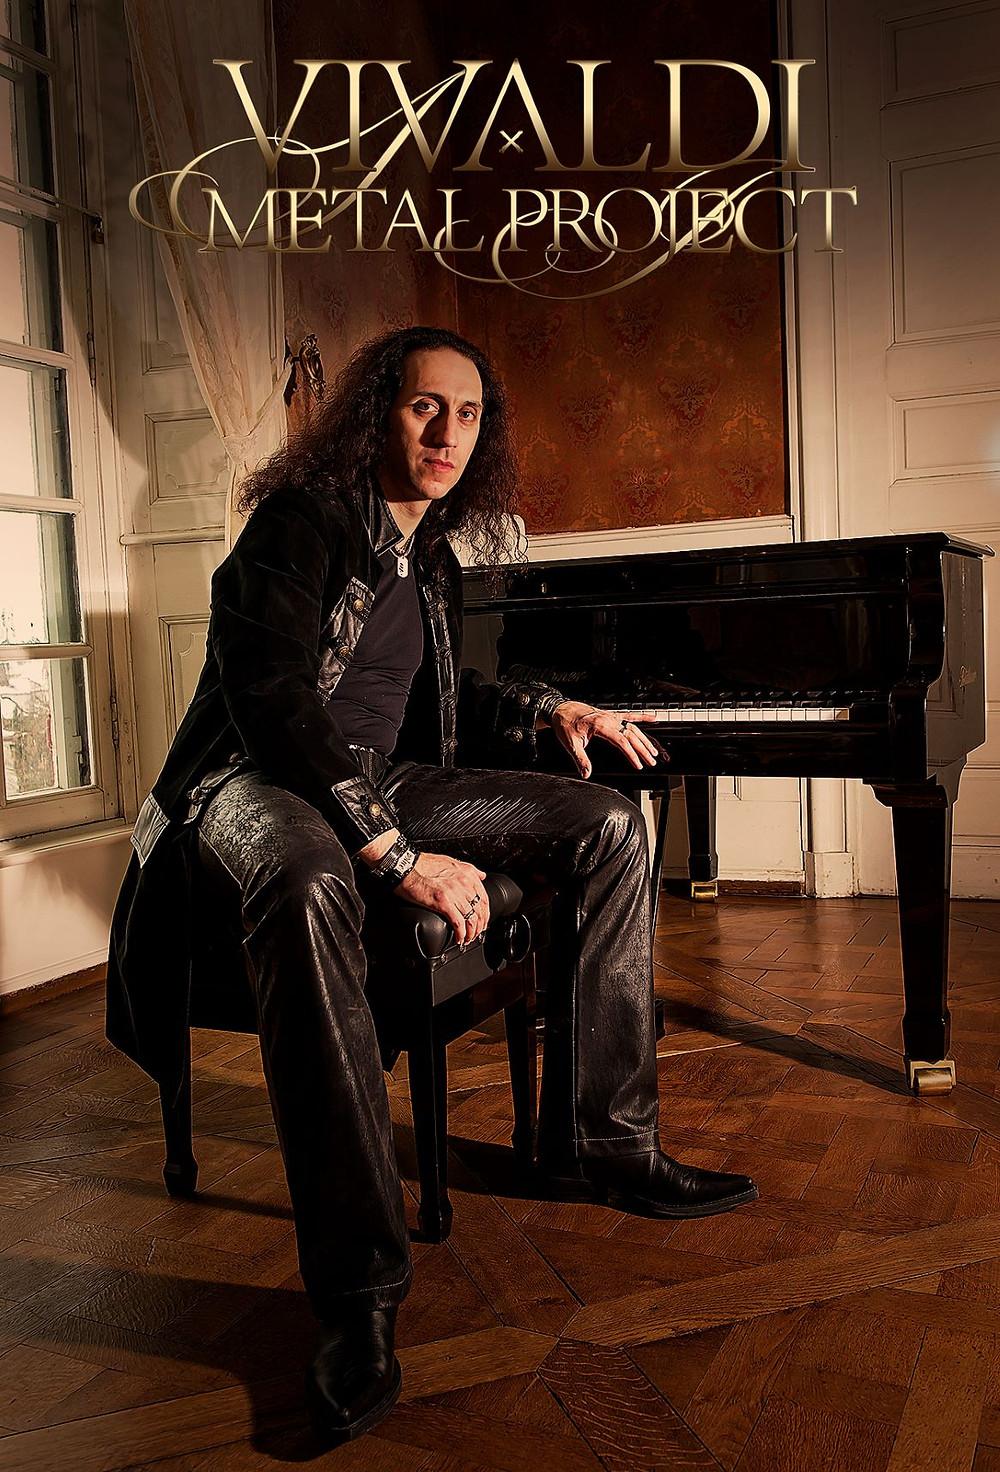 Mistheria producer Vivaldi Metal Project